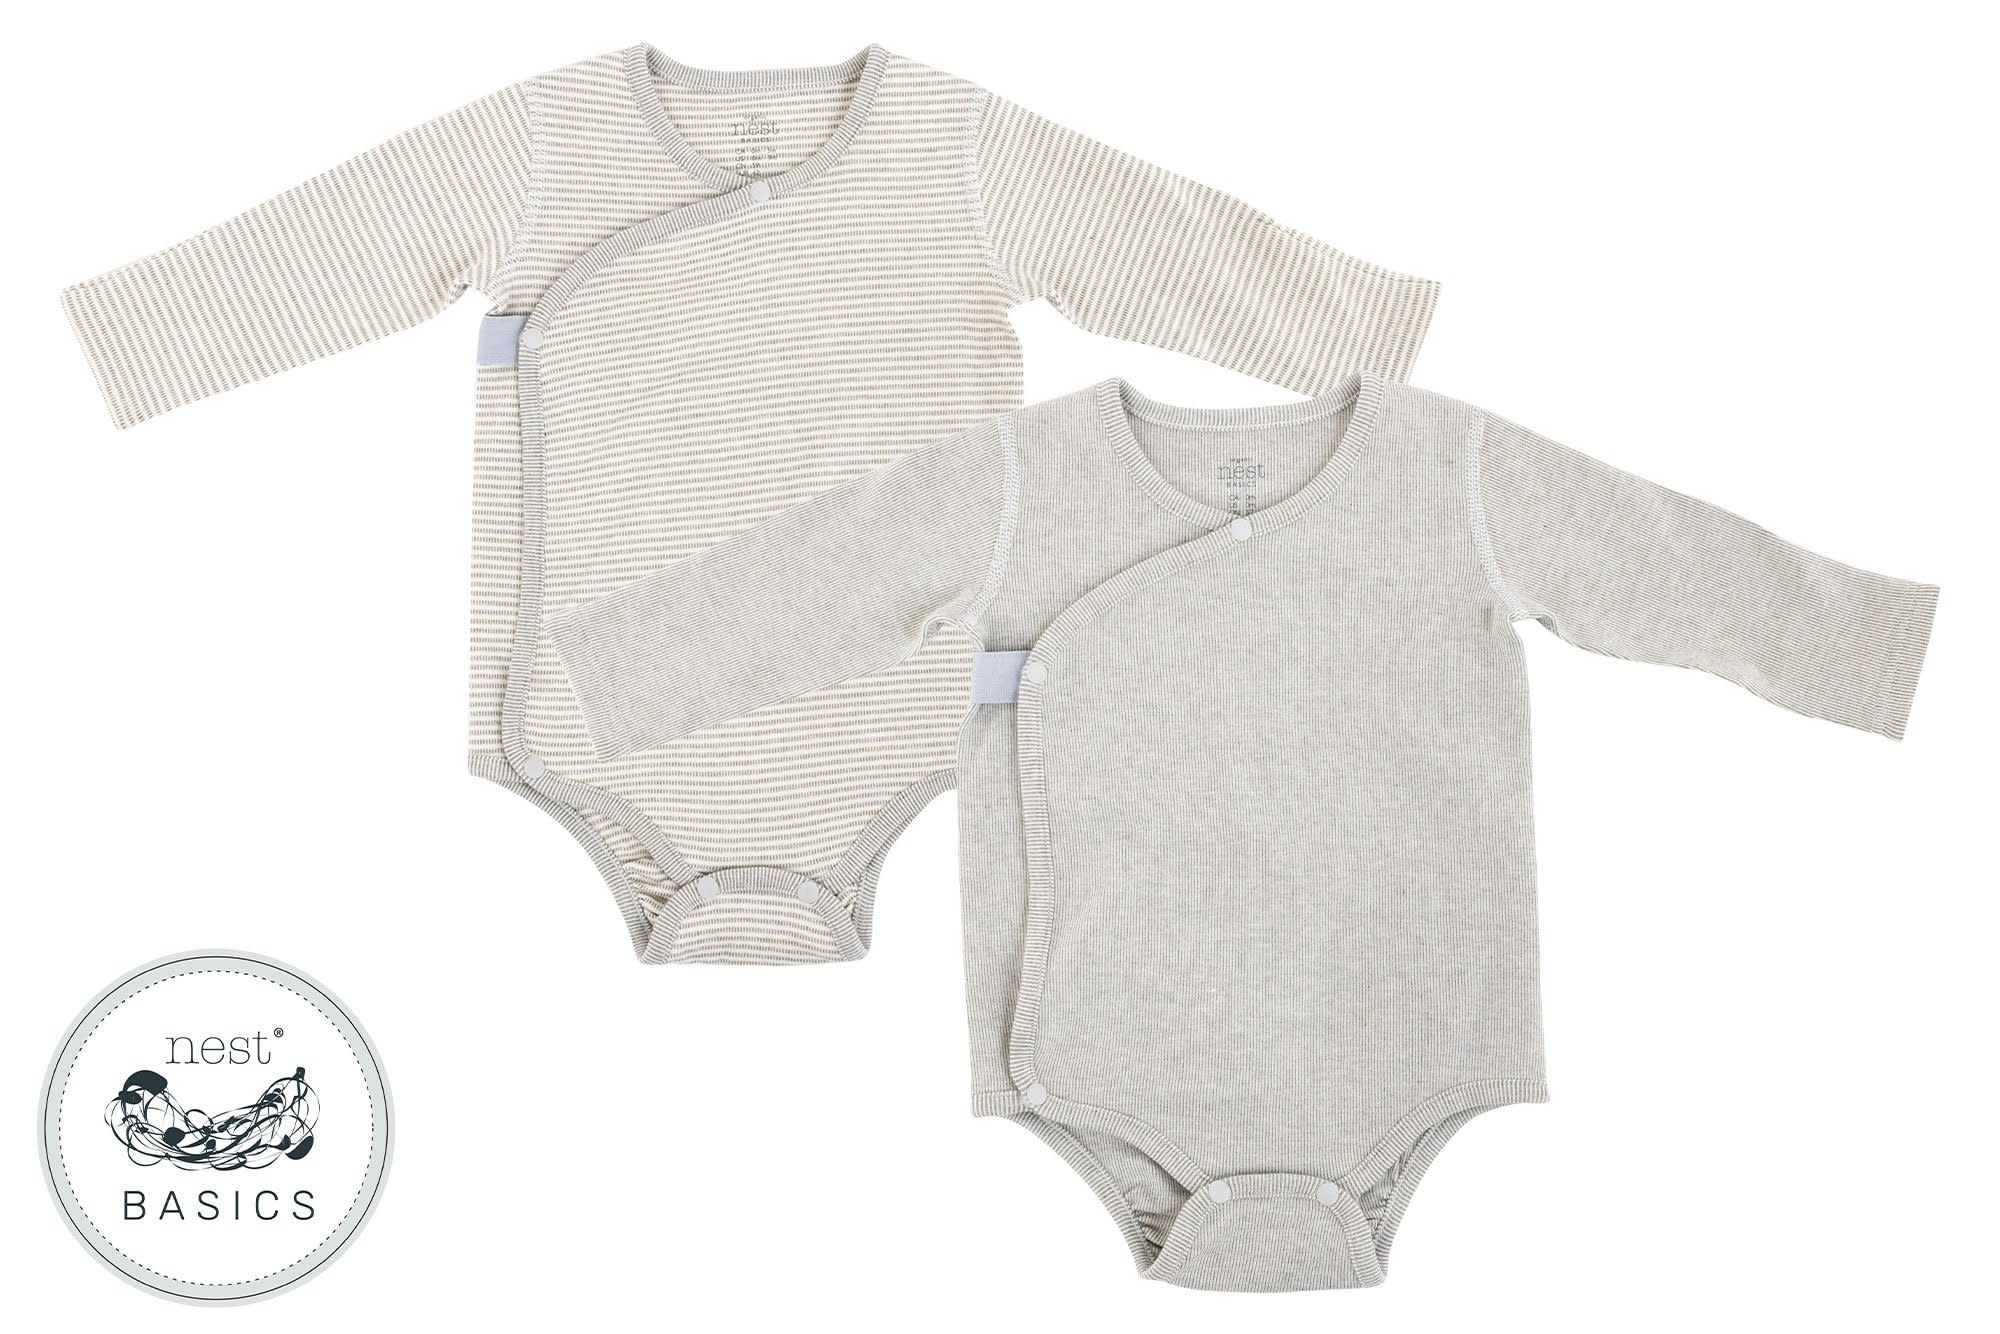 Nest Designs Basics Ribbed Long Sleeve Onesie - Dark Grey